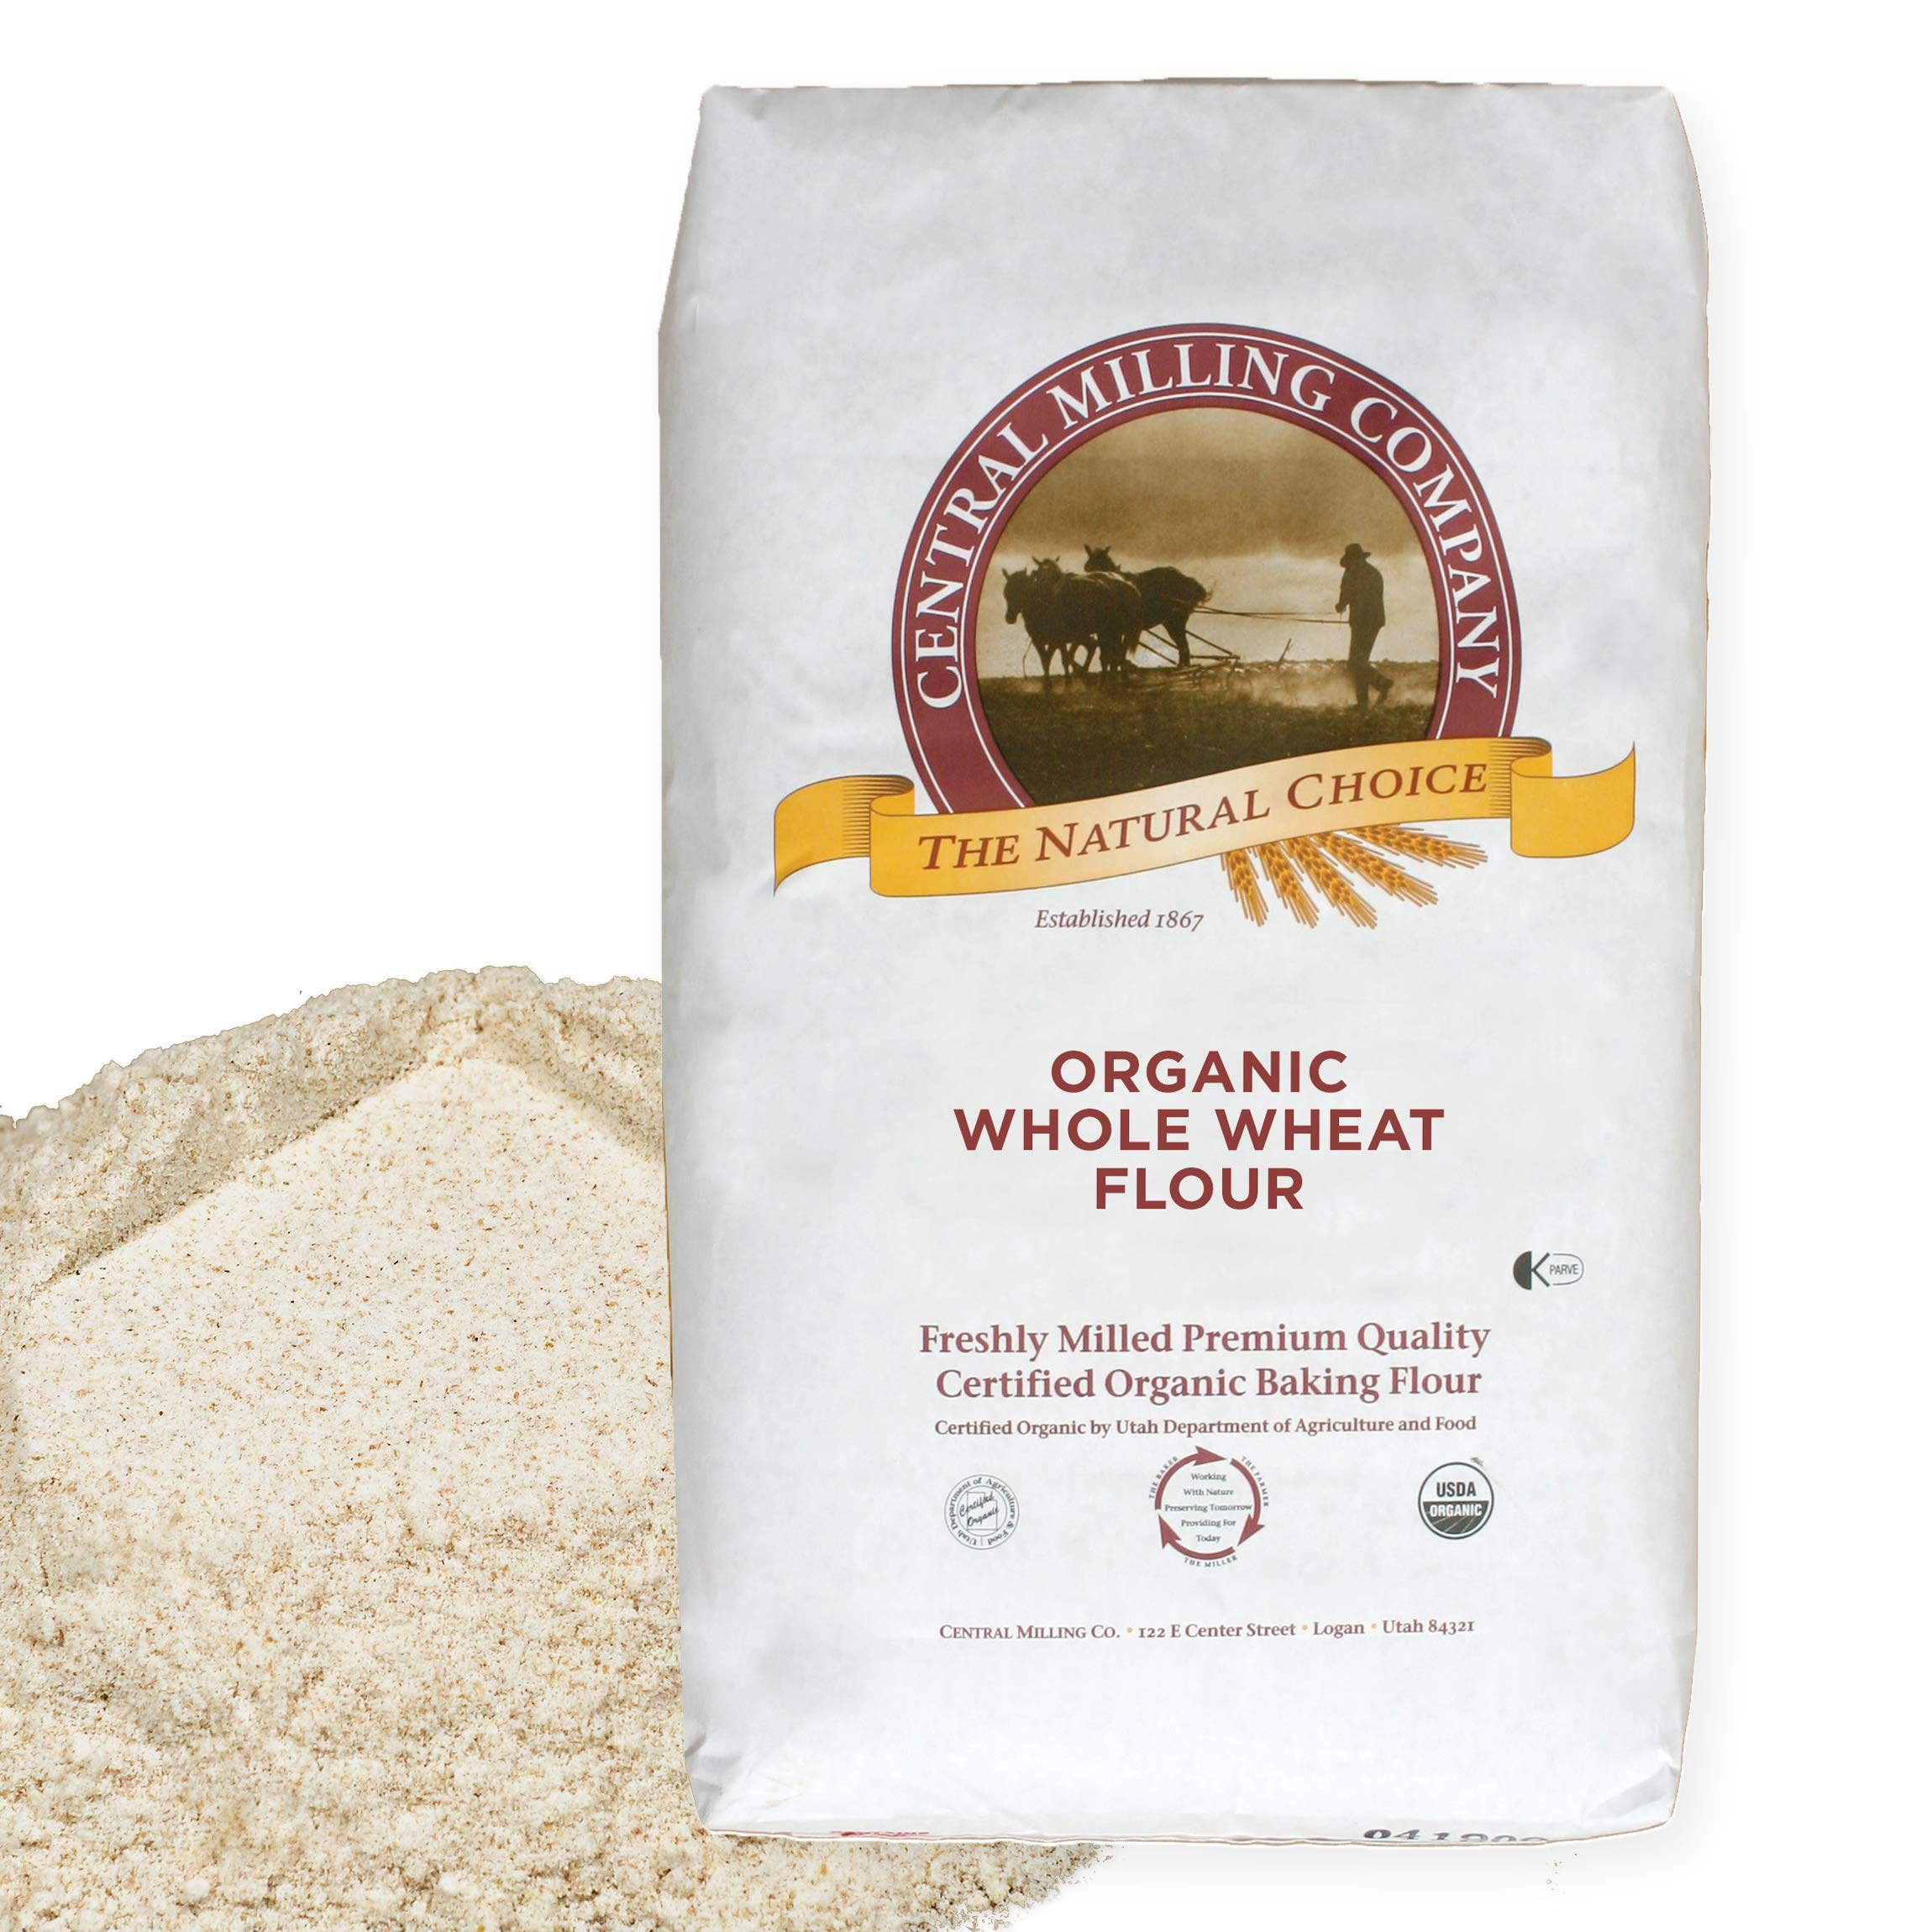 Organic 100% Whole Wheat Flour – 25 lb. bag